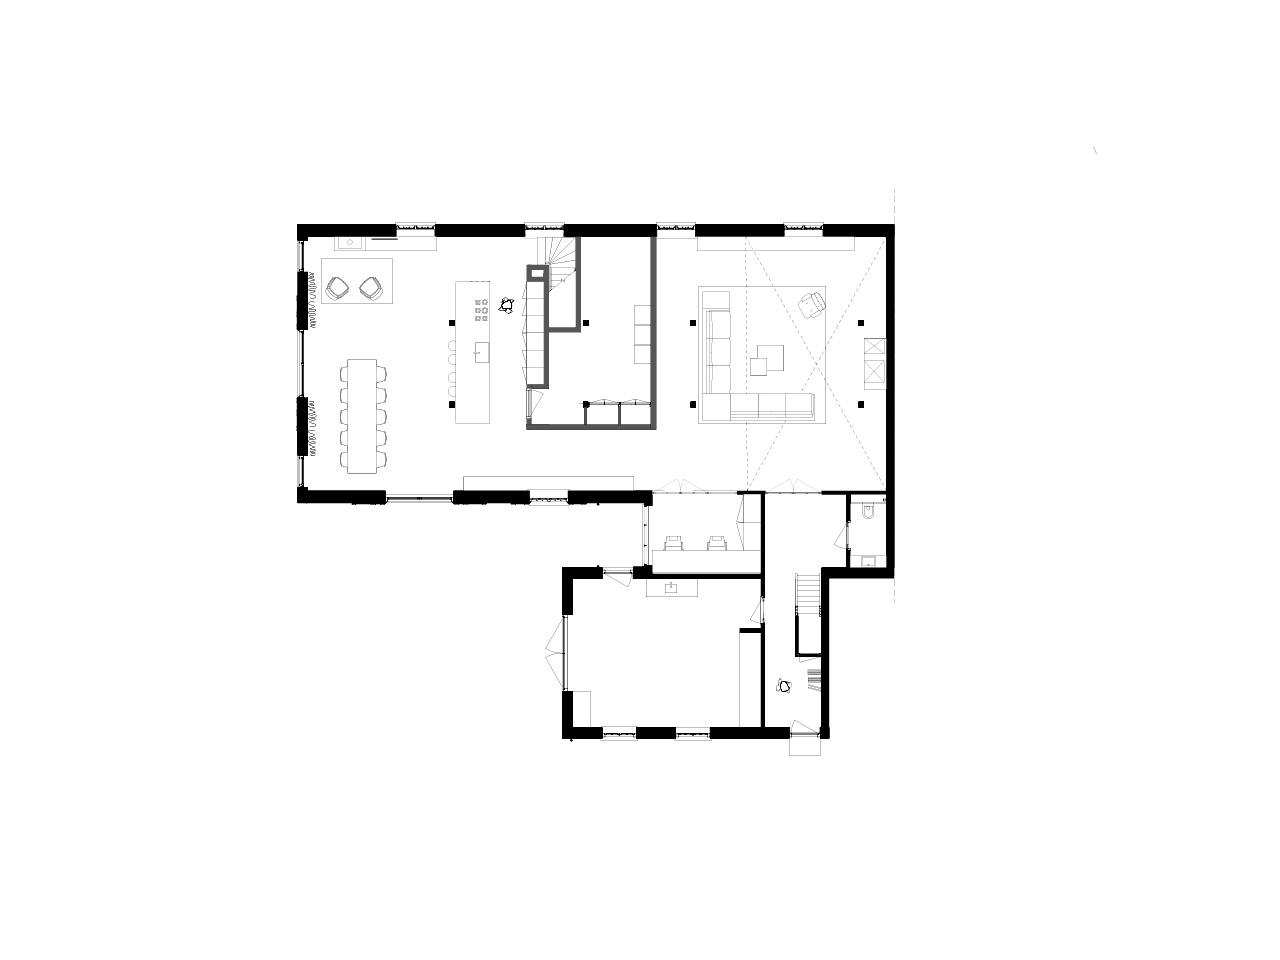 plattegrond ontwerp woonboerderij